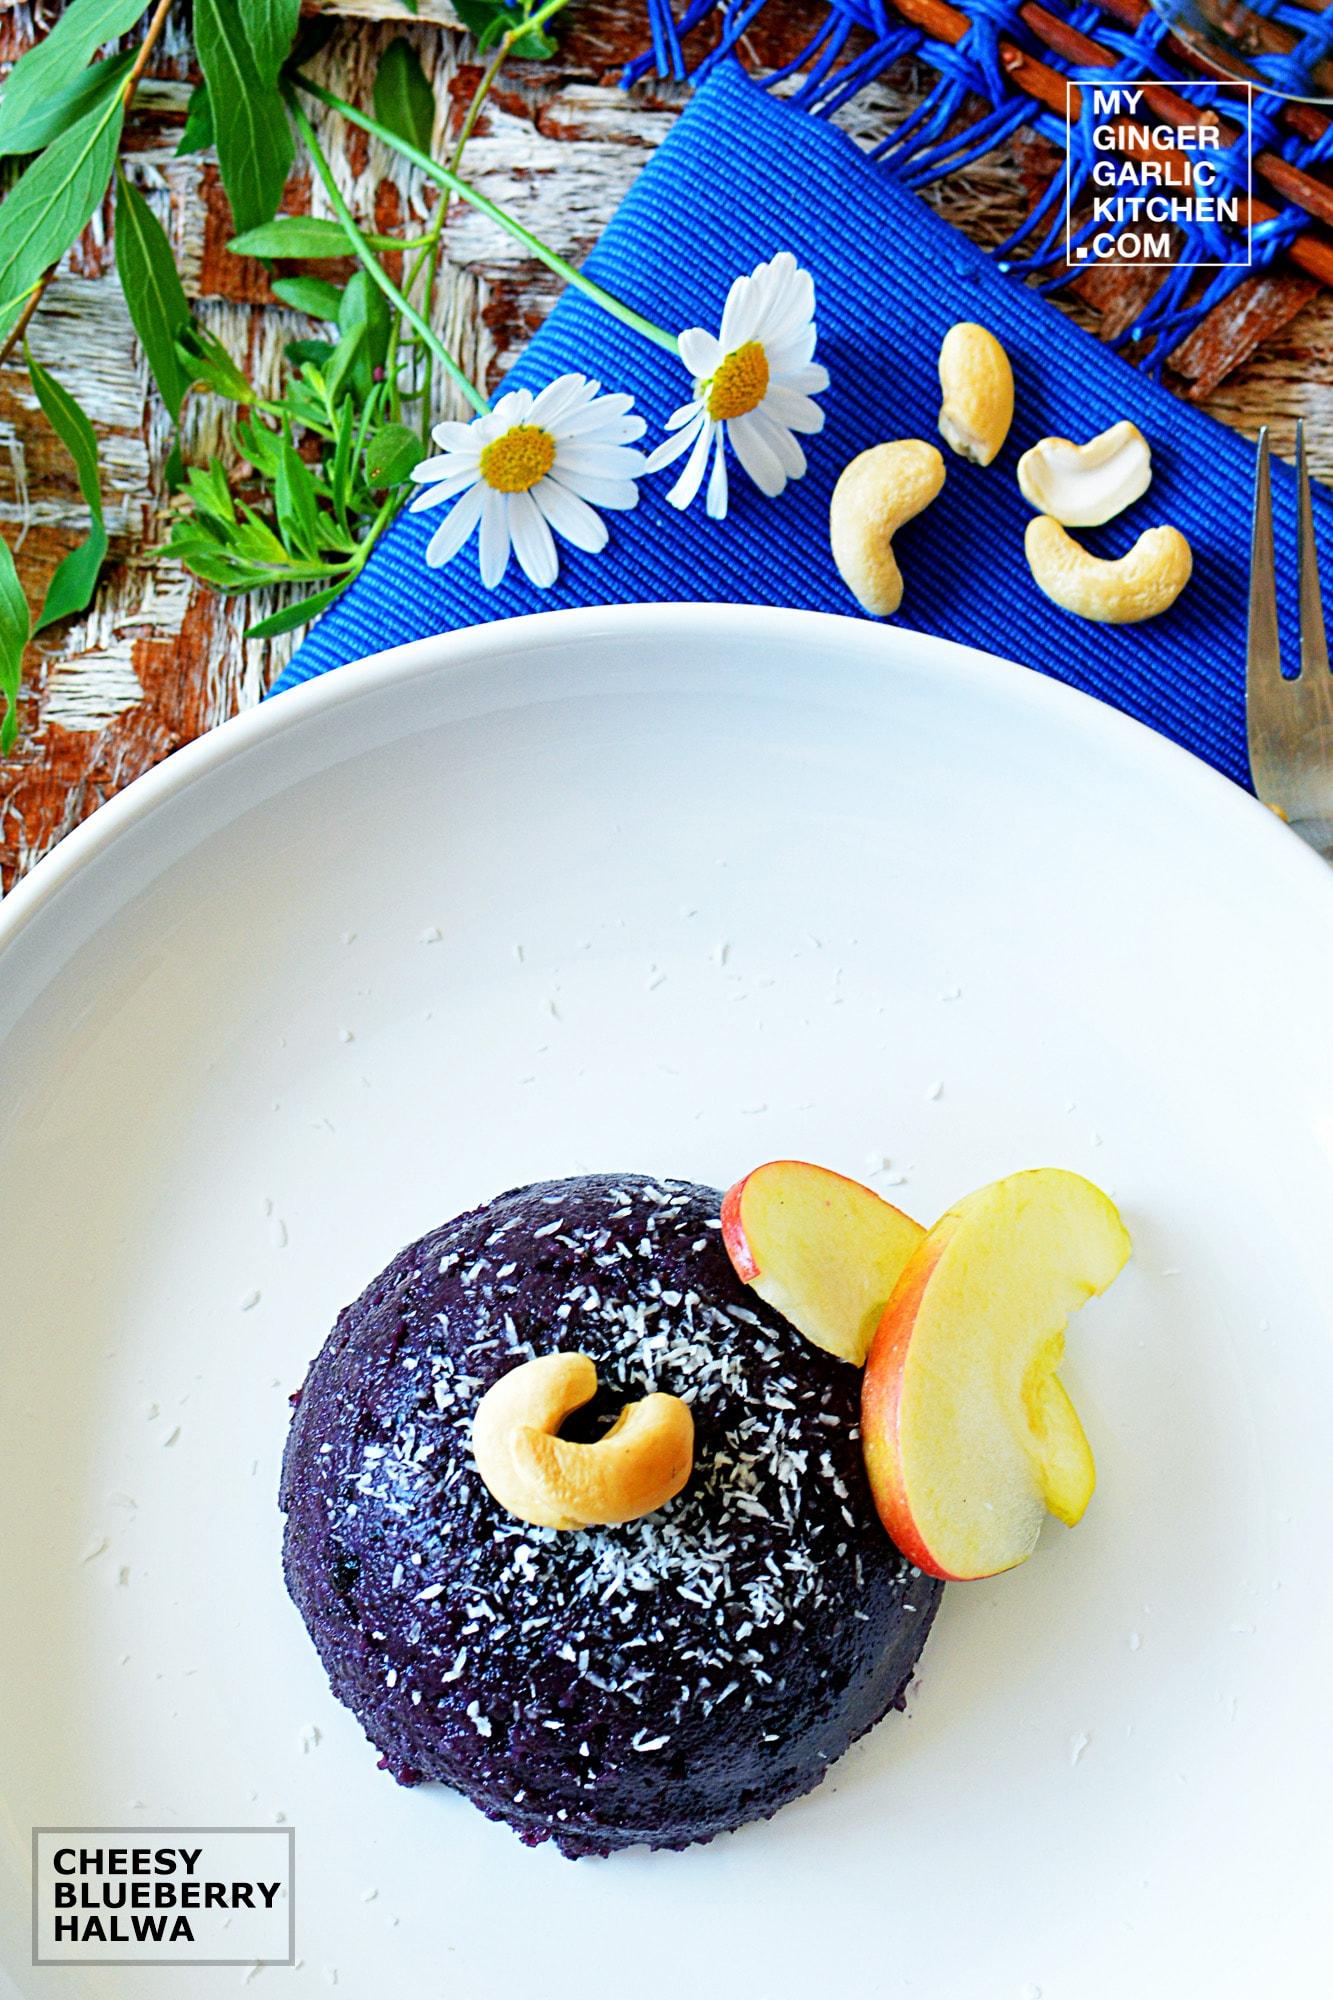 Image - recipe cheesy blueberry halwa anupama paliwal my ginger garlic kitchen 4